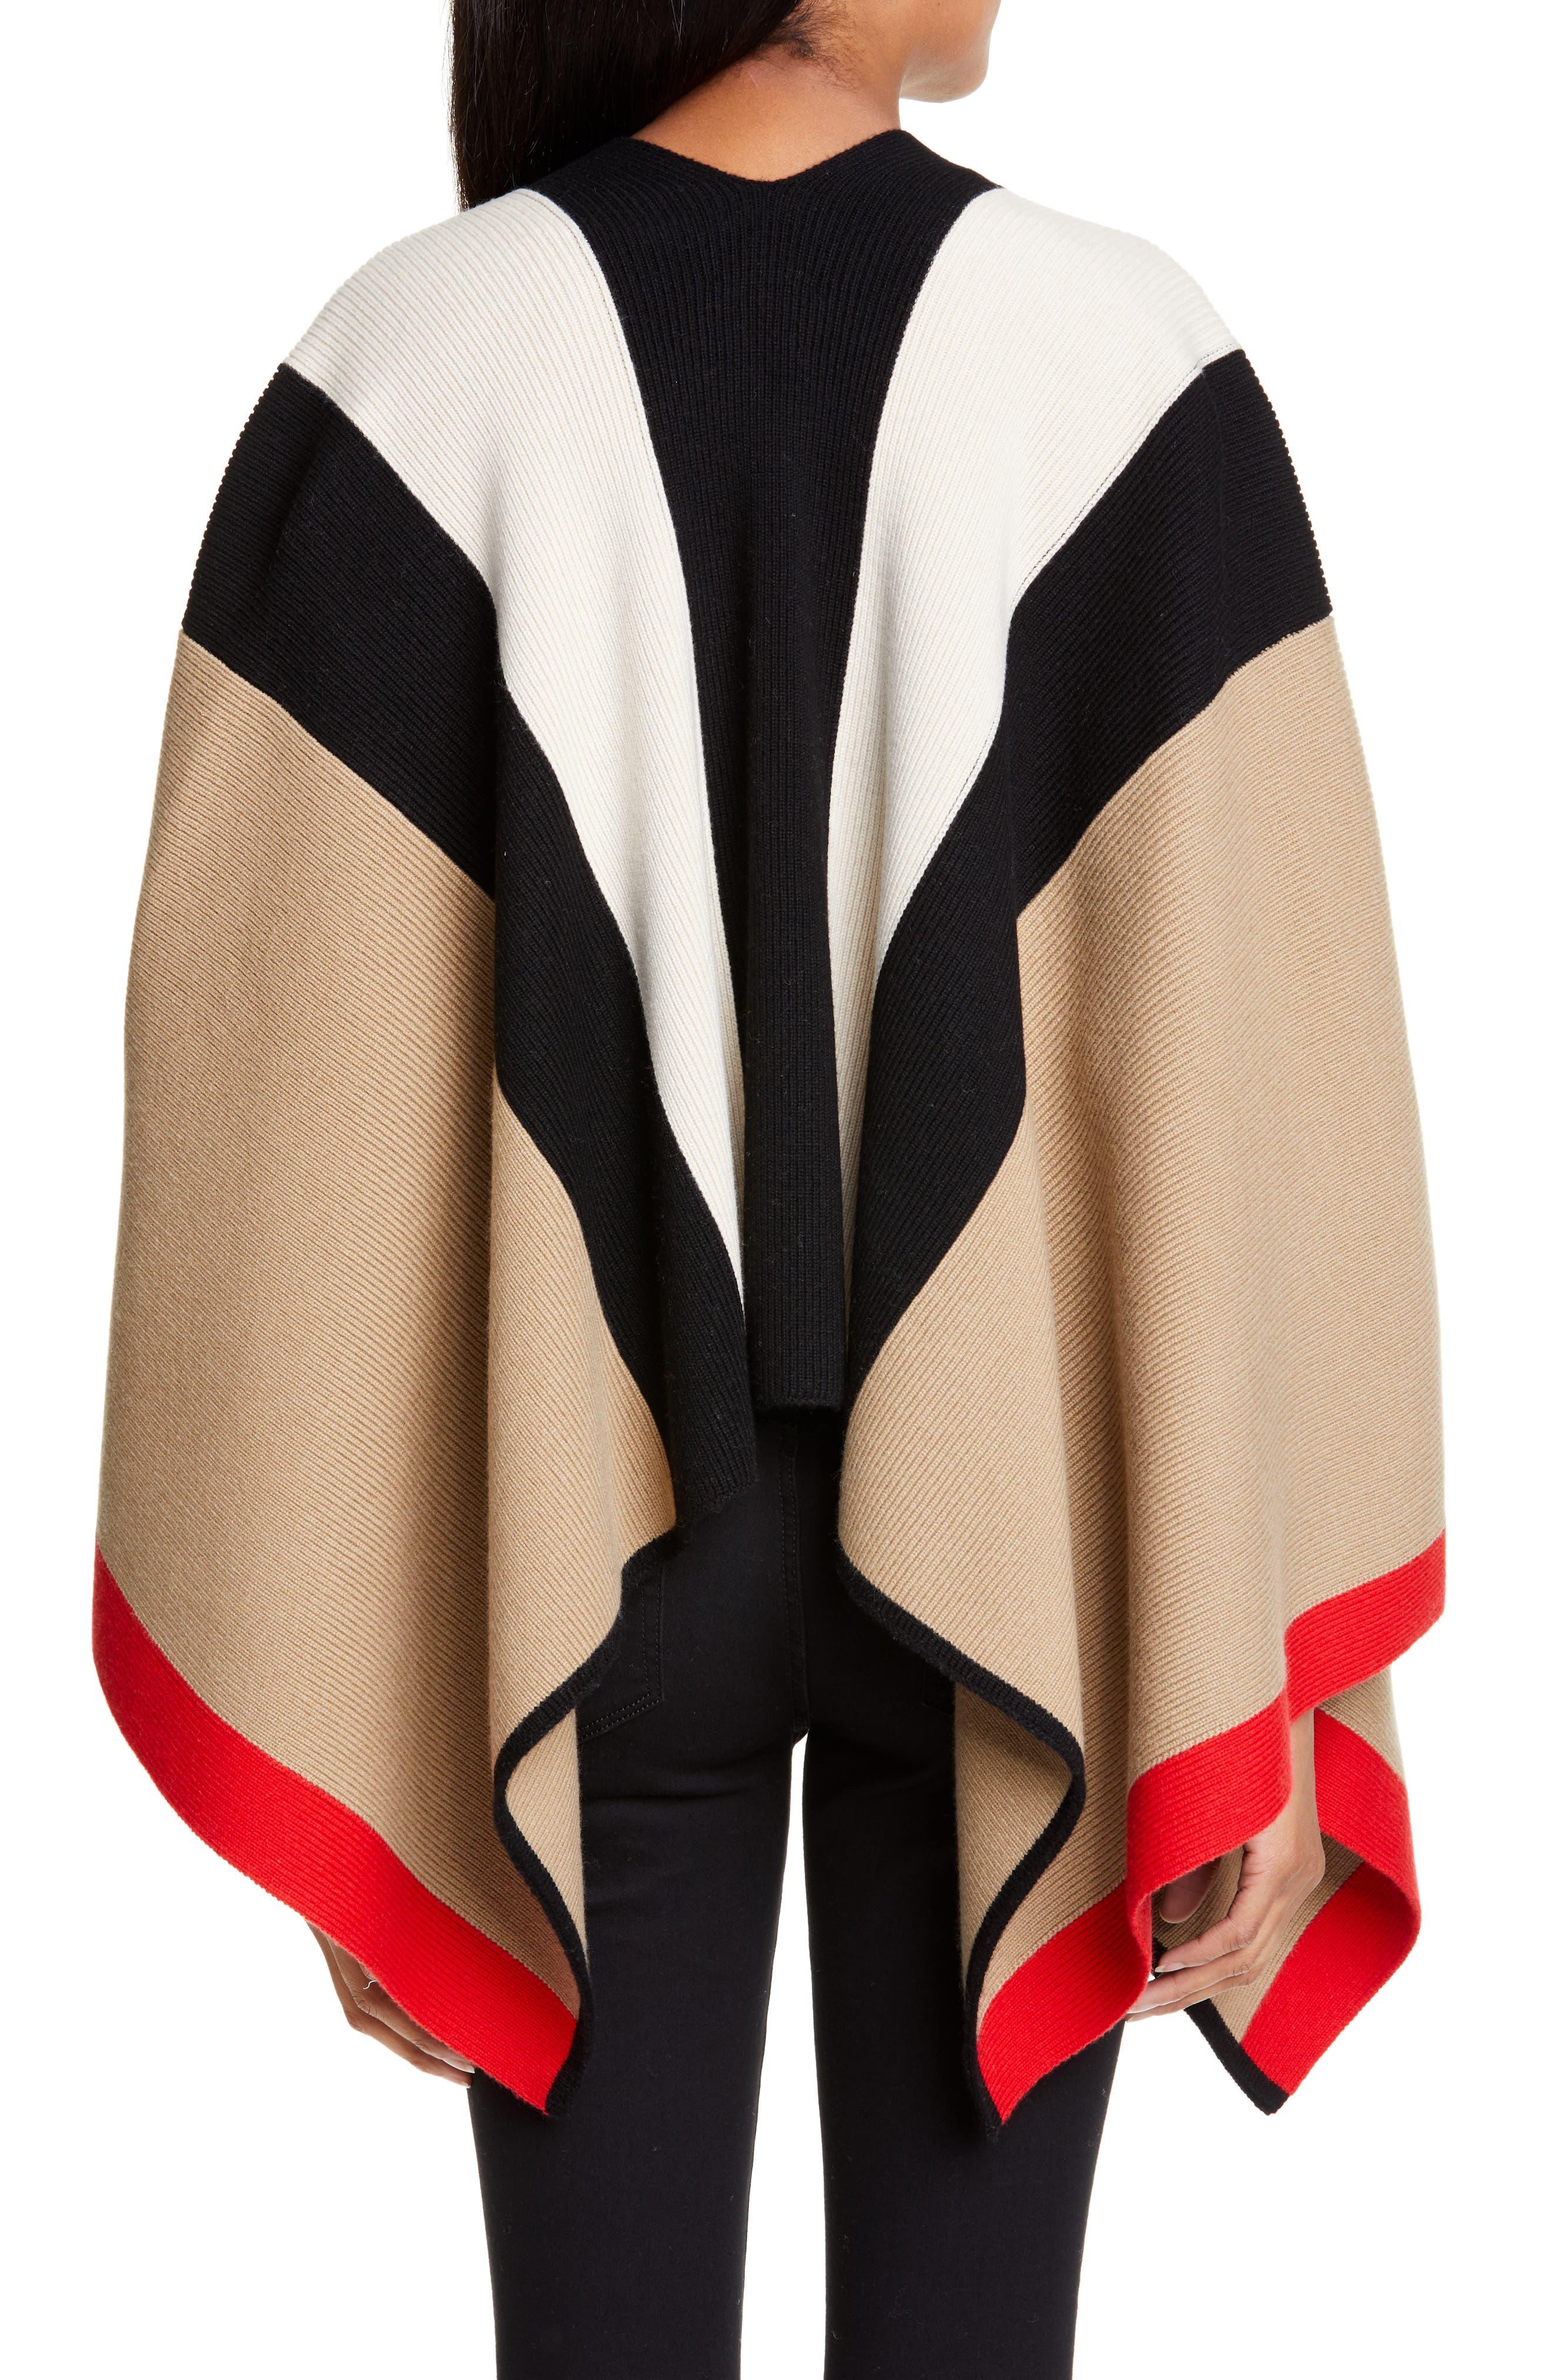 BURBERRY, Stripe Wool & Cashmere Cape, Alternate thumbnail 2, color, CAMEL